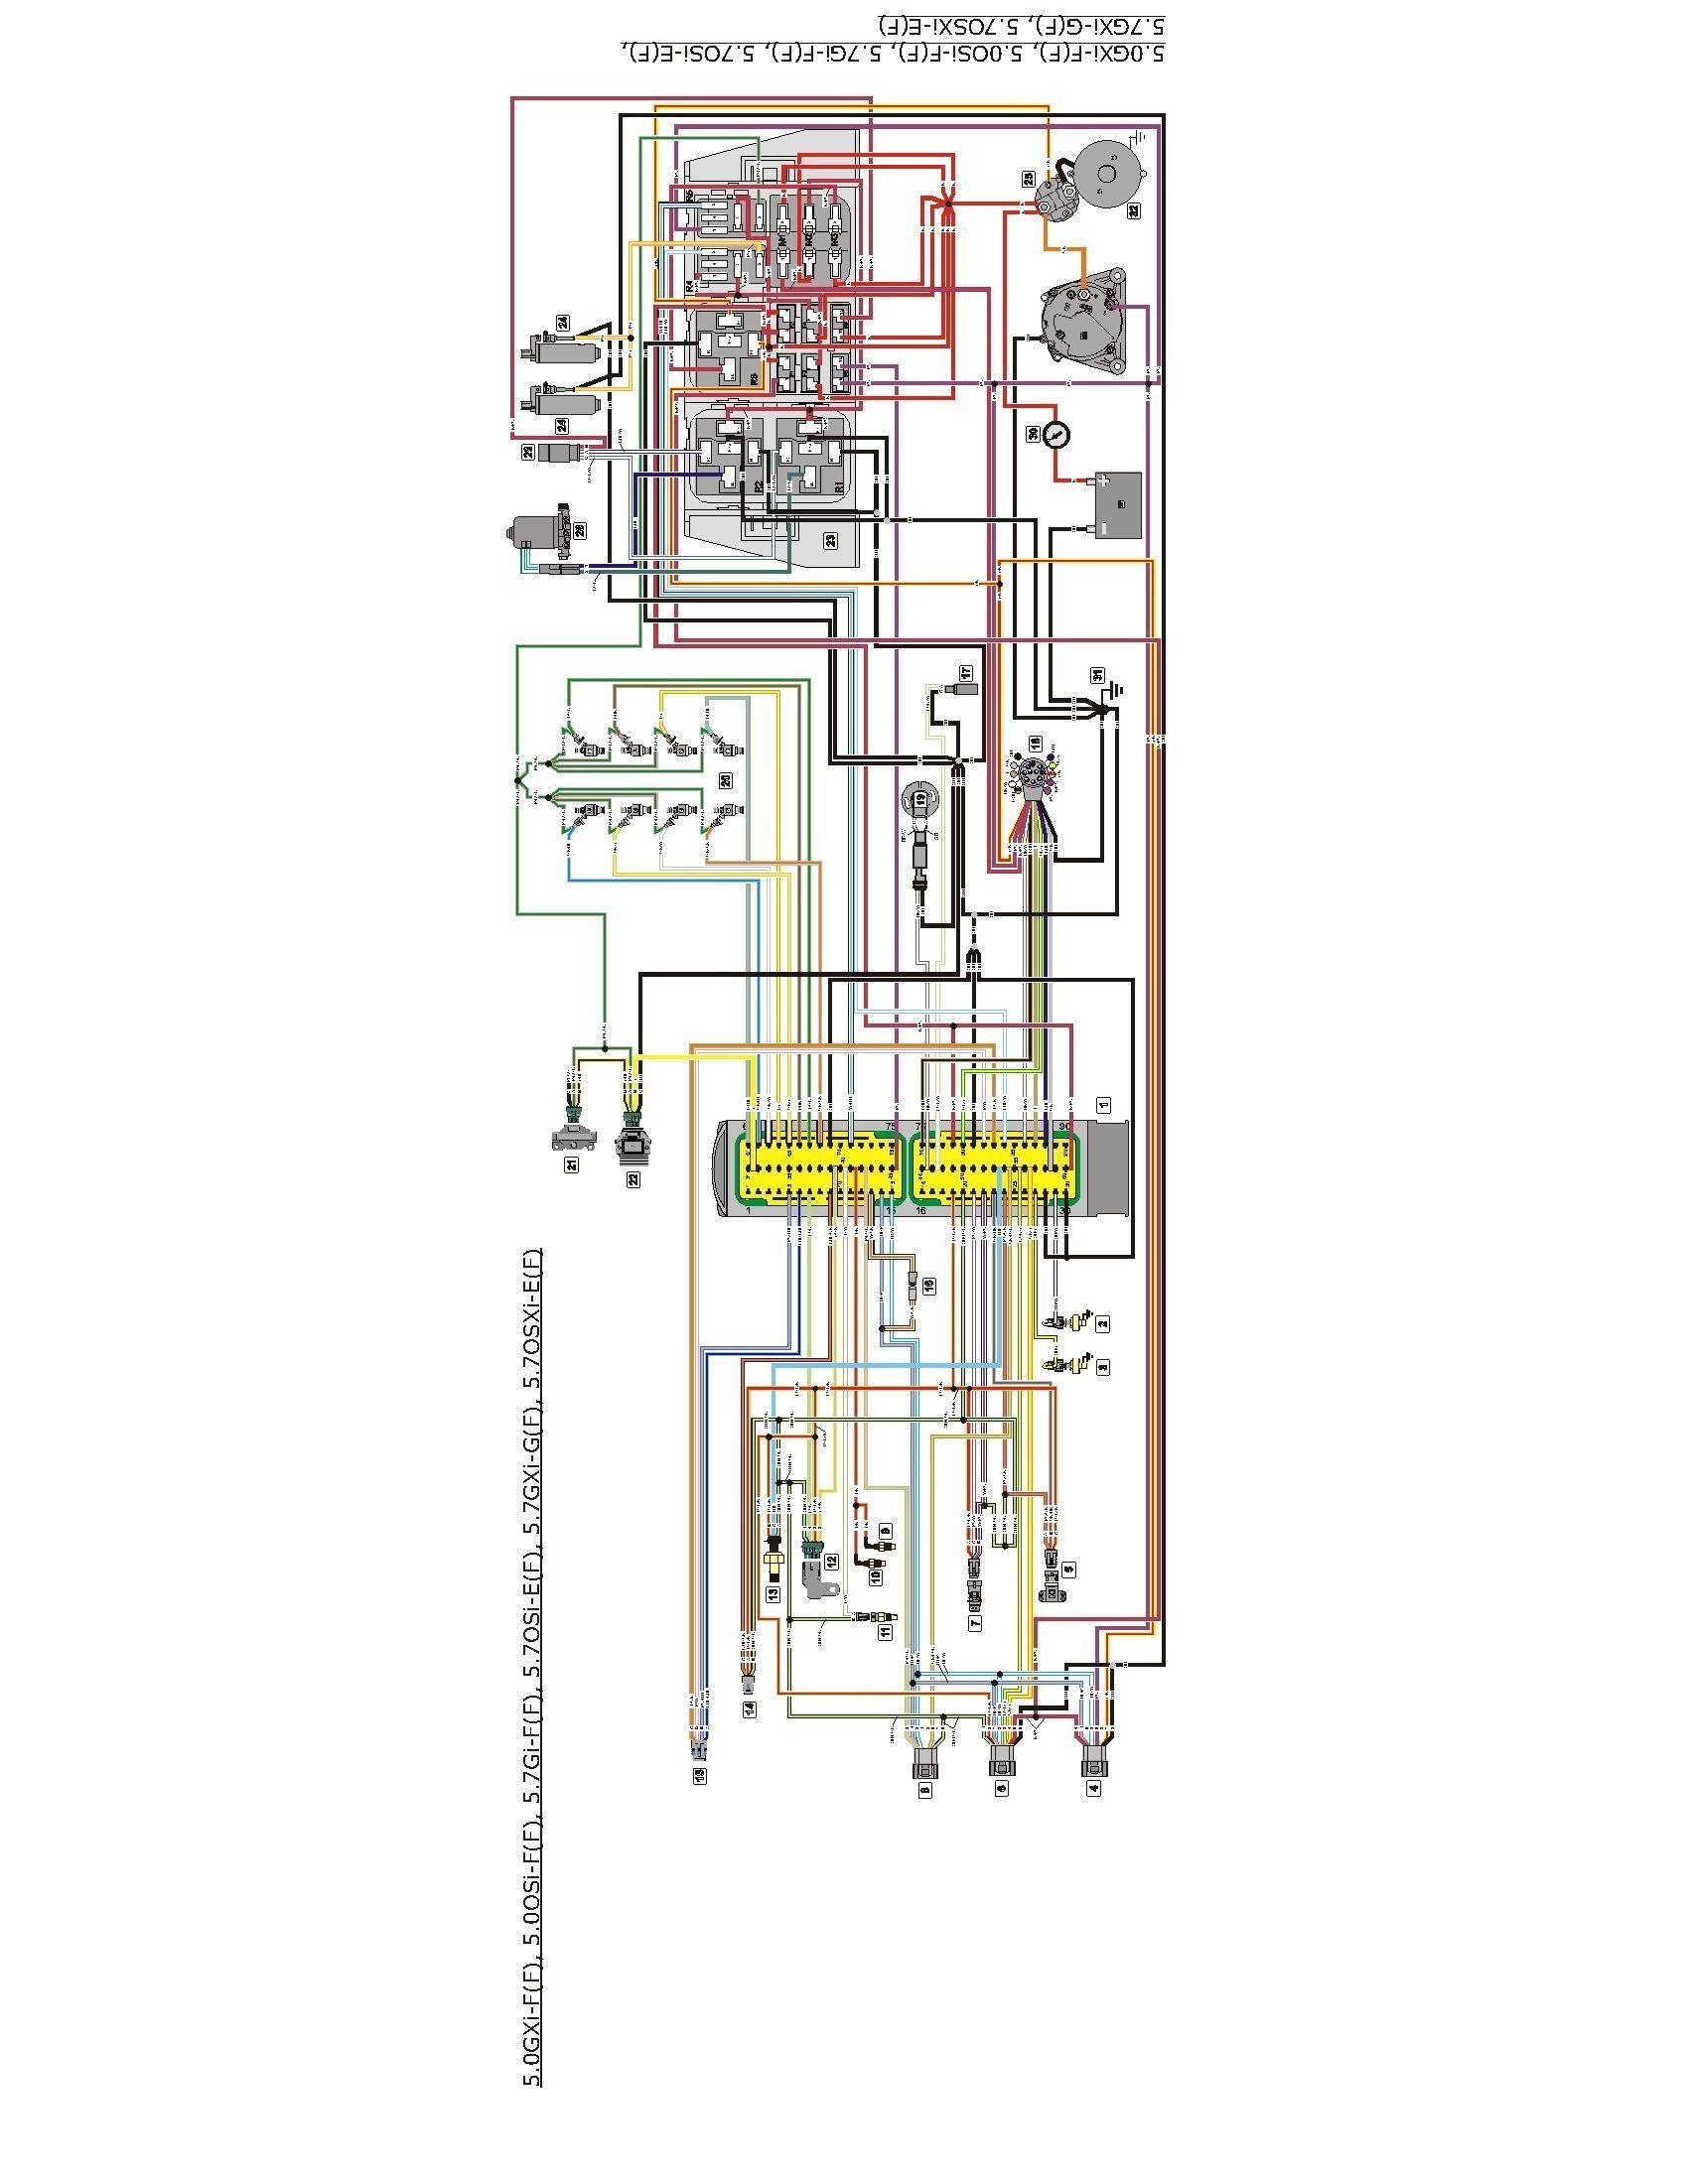 60 Awesome Volvo Penta Starter Wiring Diagram Volvo Diagram Wire